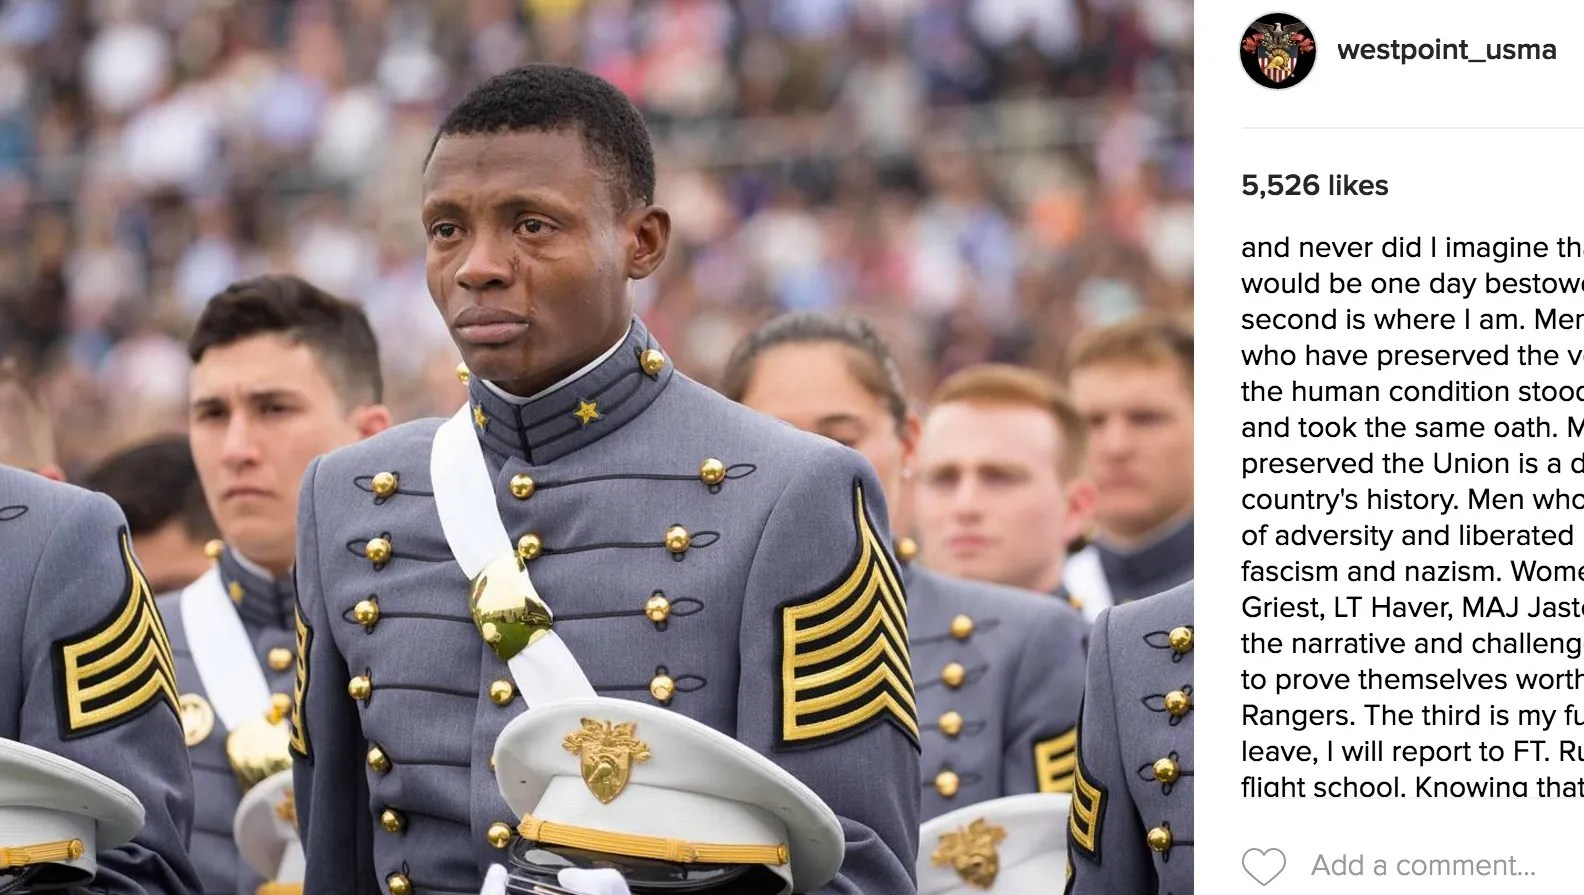 haiti born cadet weeps